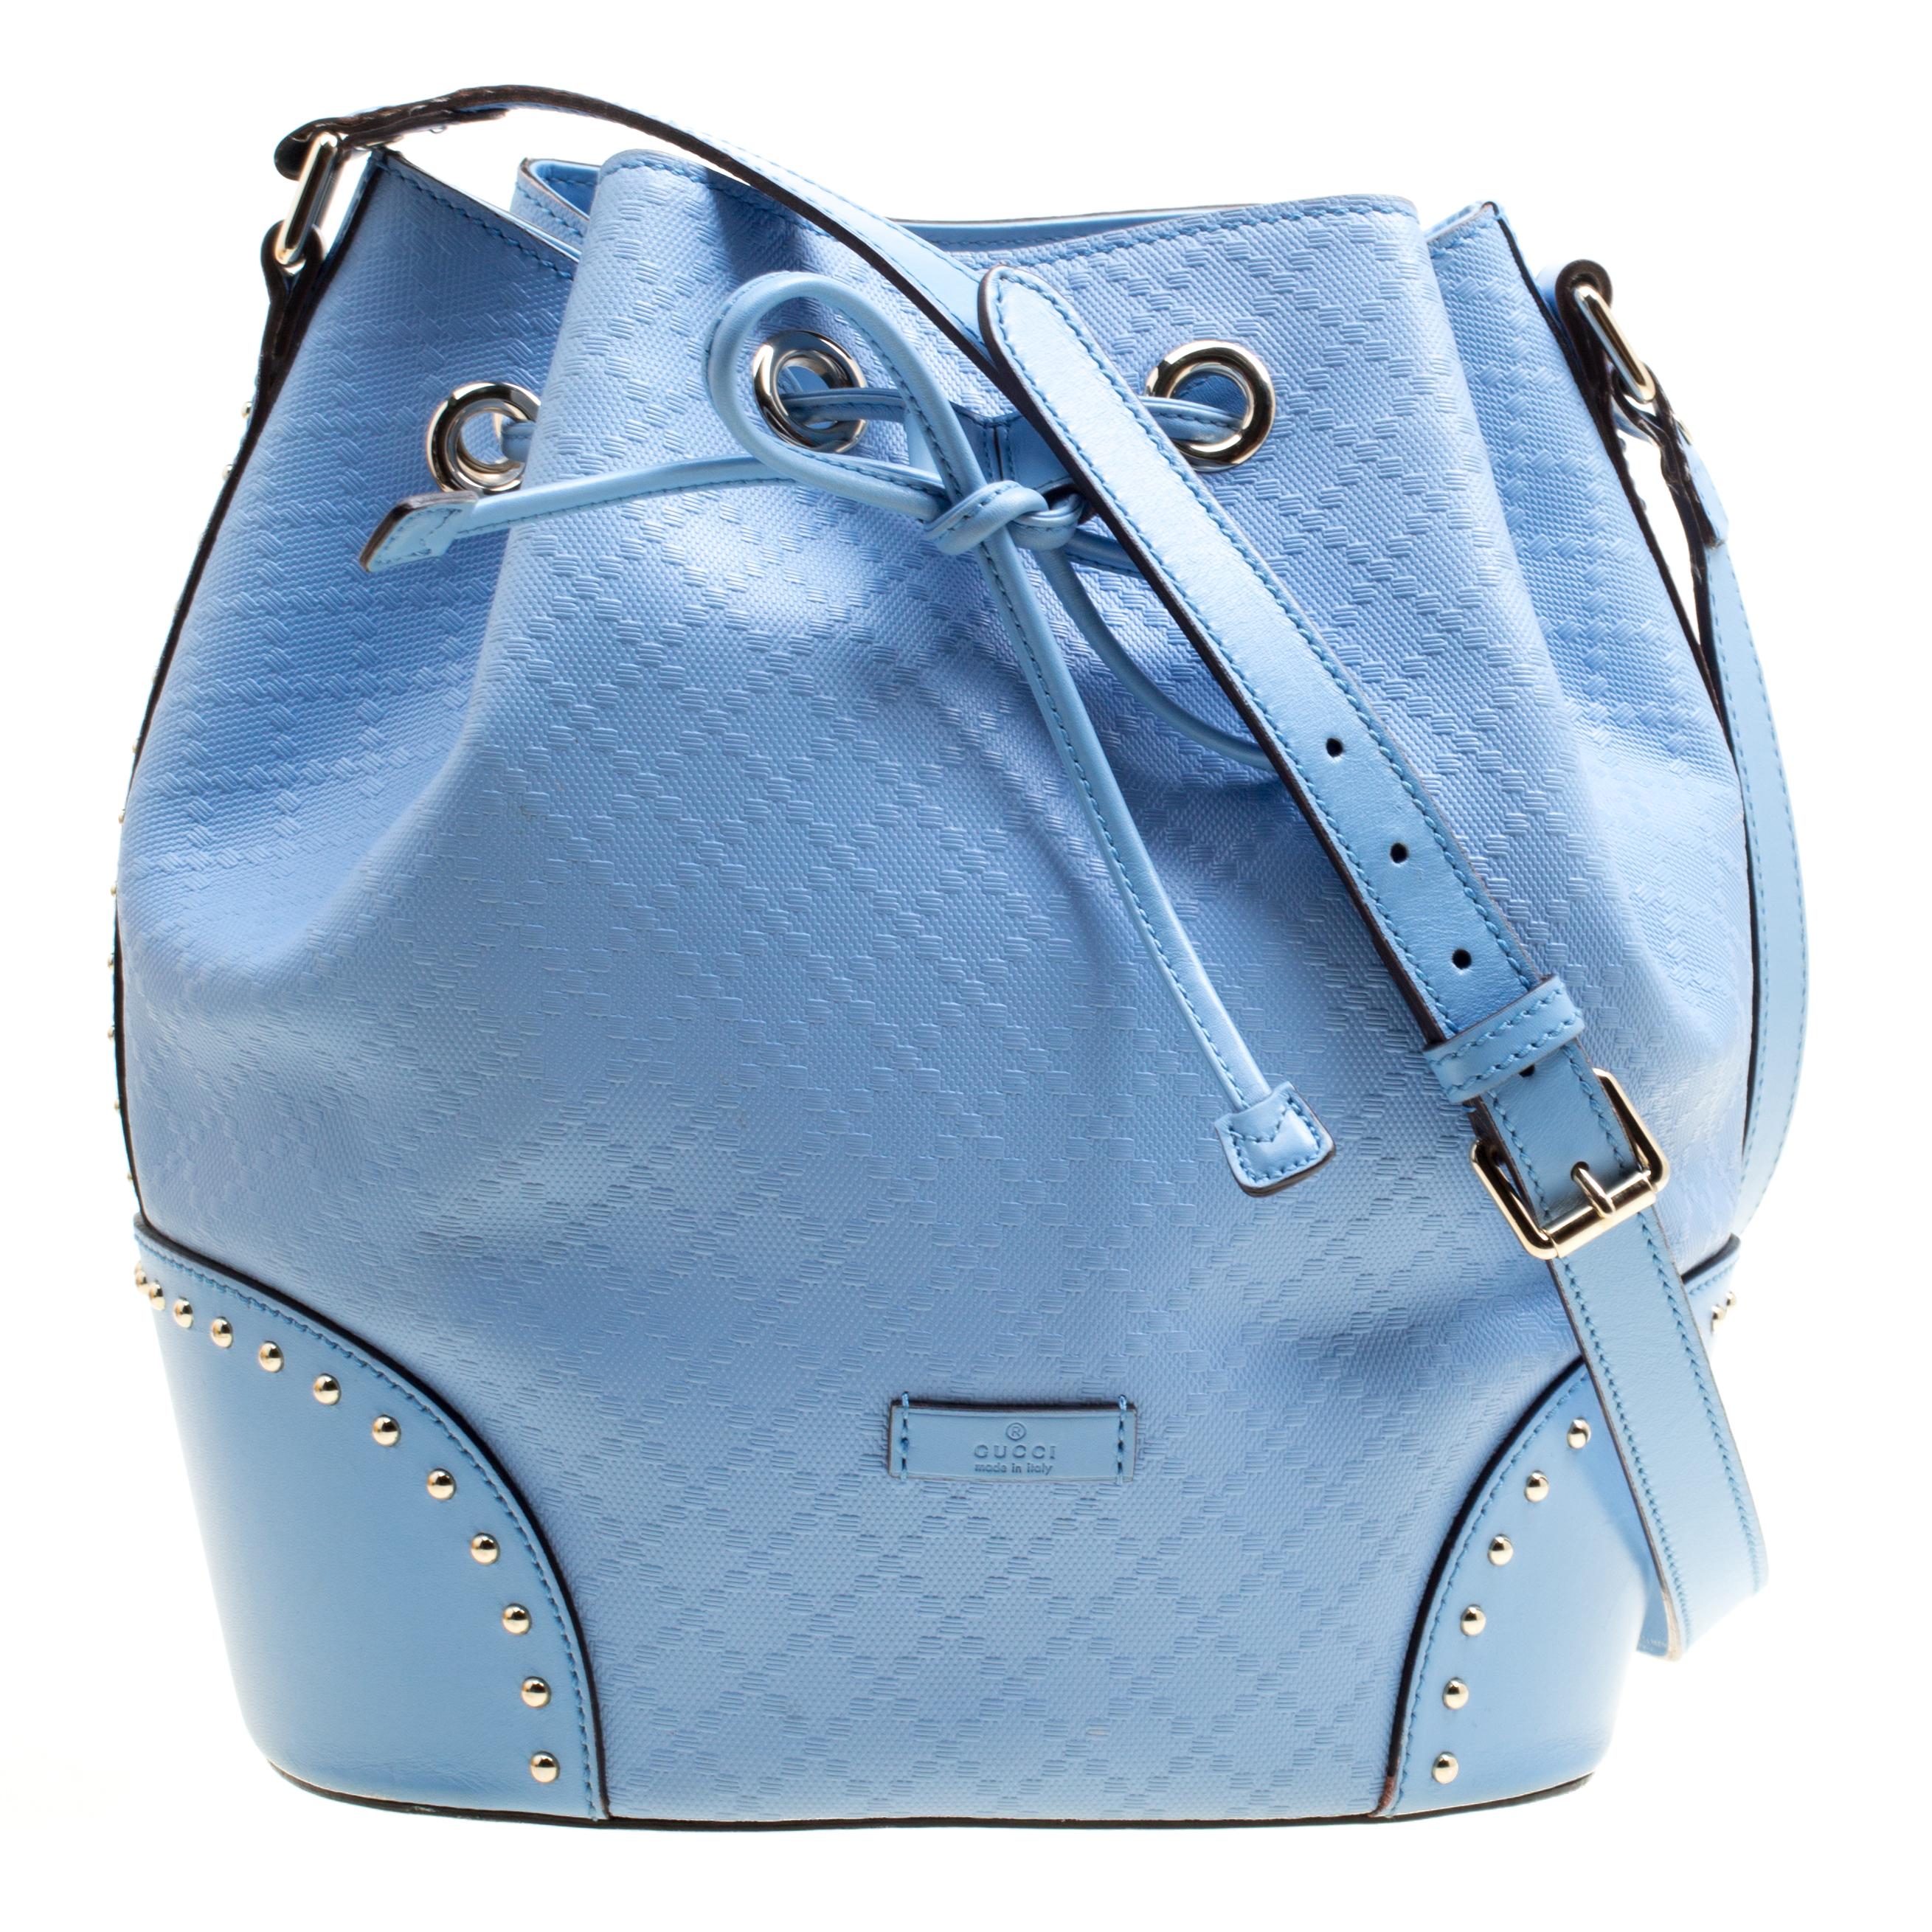 53b2330edc3 Gucci Sky Blue Diamante Textured Leather Bucket Bag